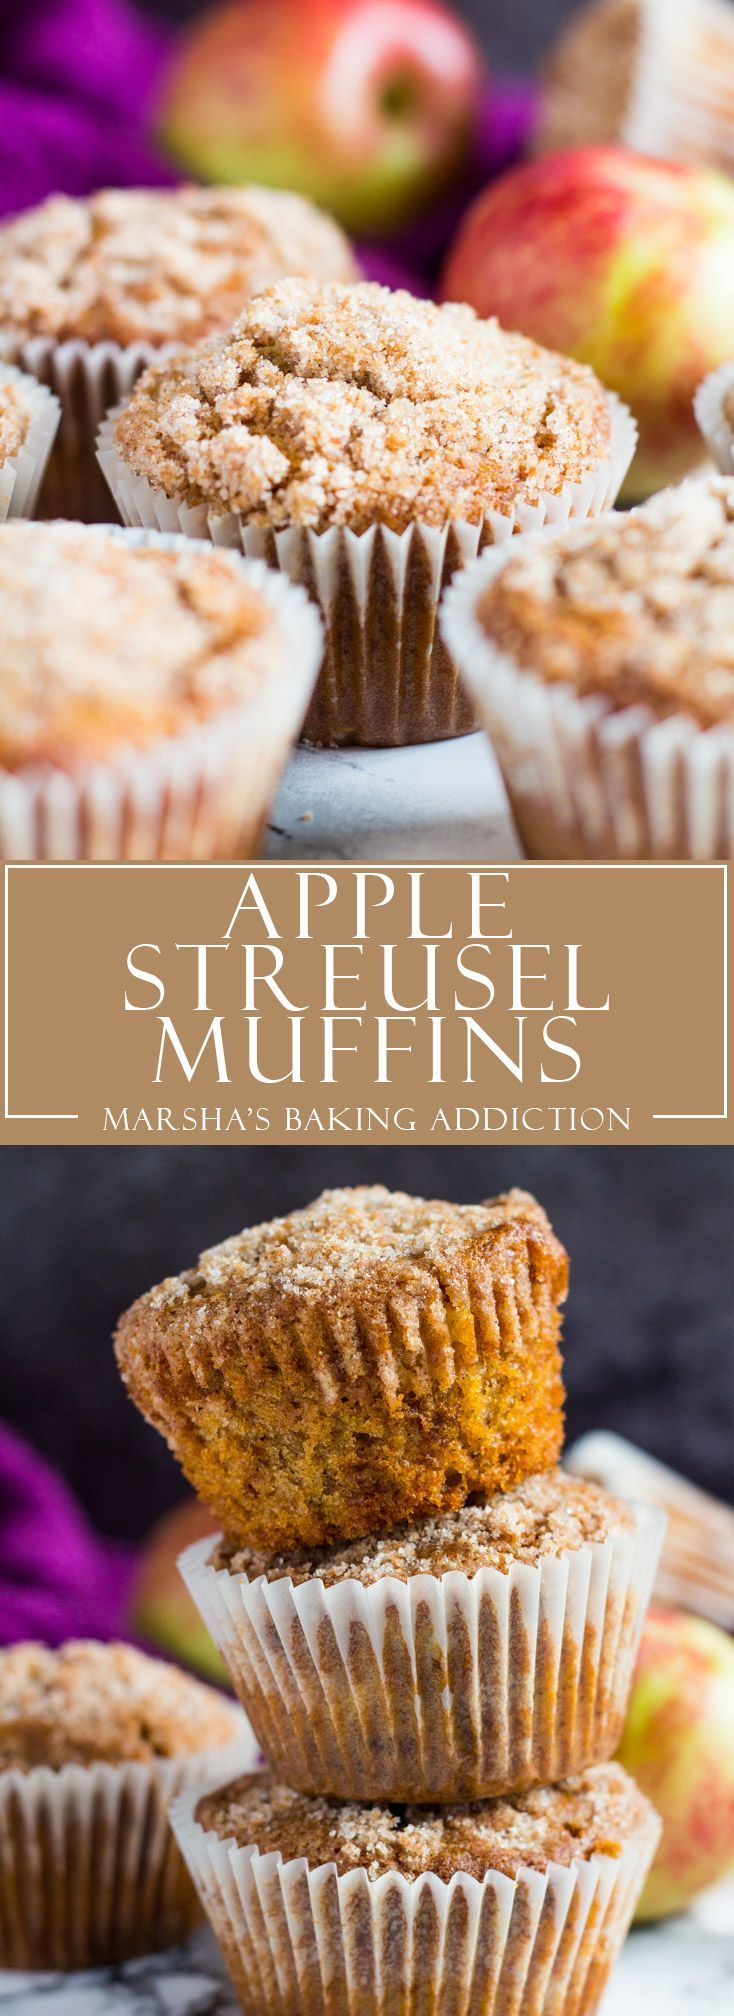 Apple Streusel Muffins   http://marshasbakingaddiction.com /marshasbakeblog/